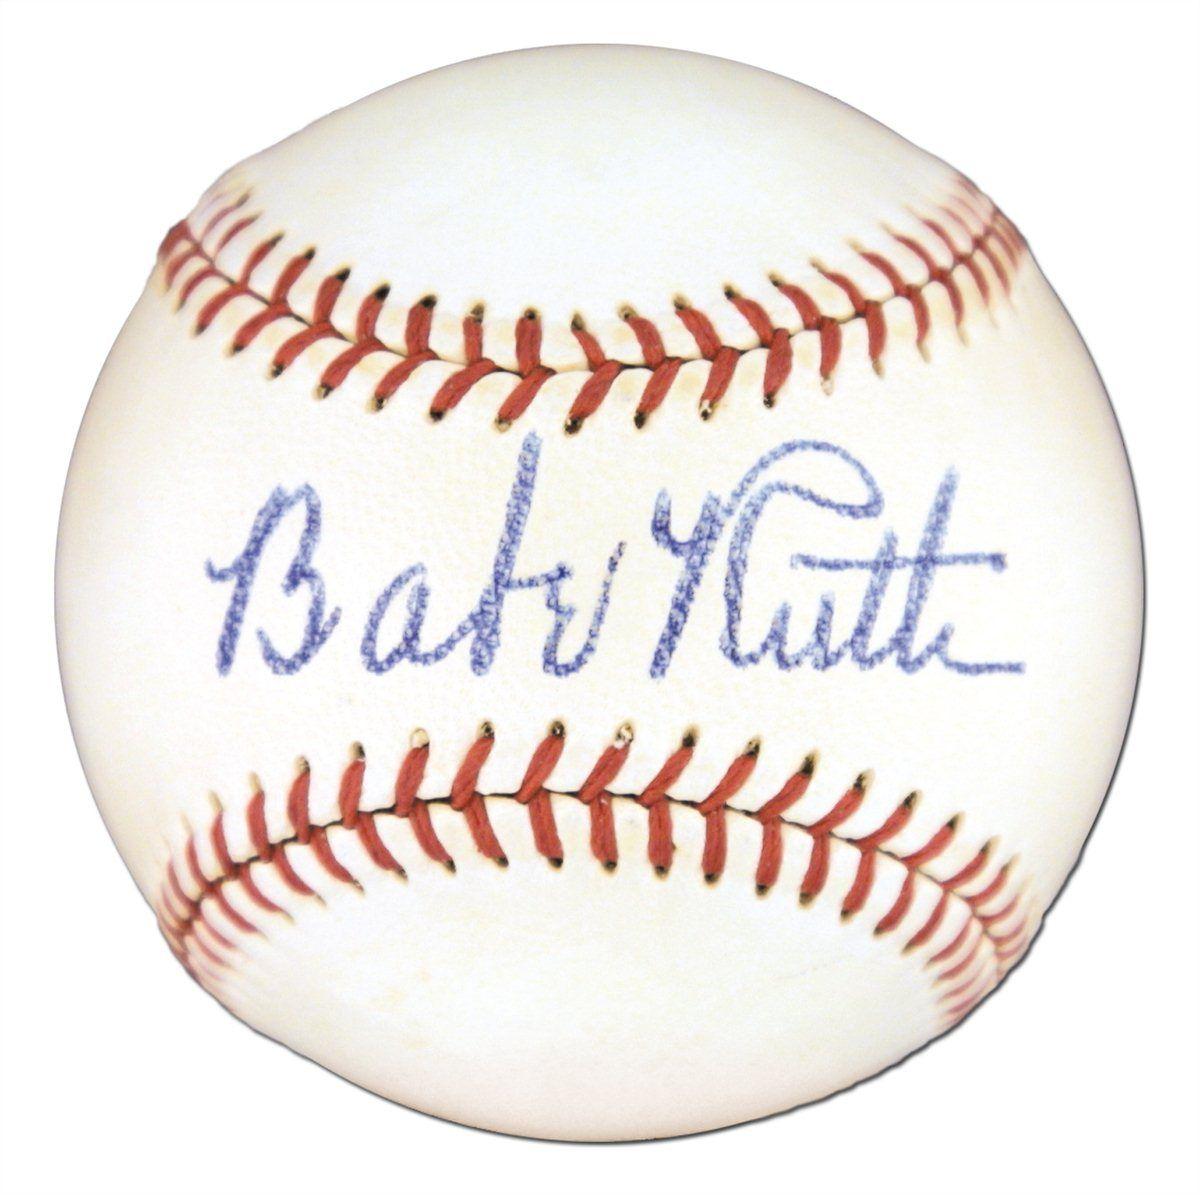 Babe Ruth Psa Autographfacts Babe Ruth Babe Ruth Signed Baseball Autograph